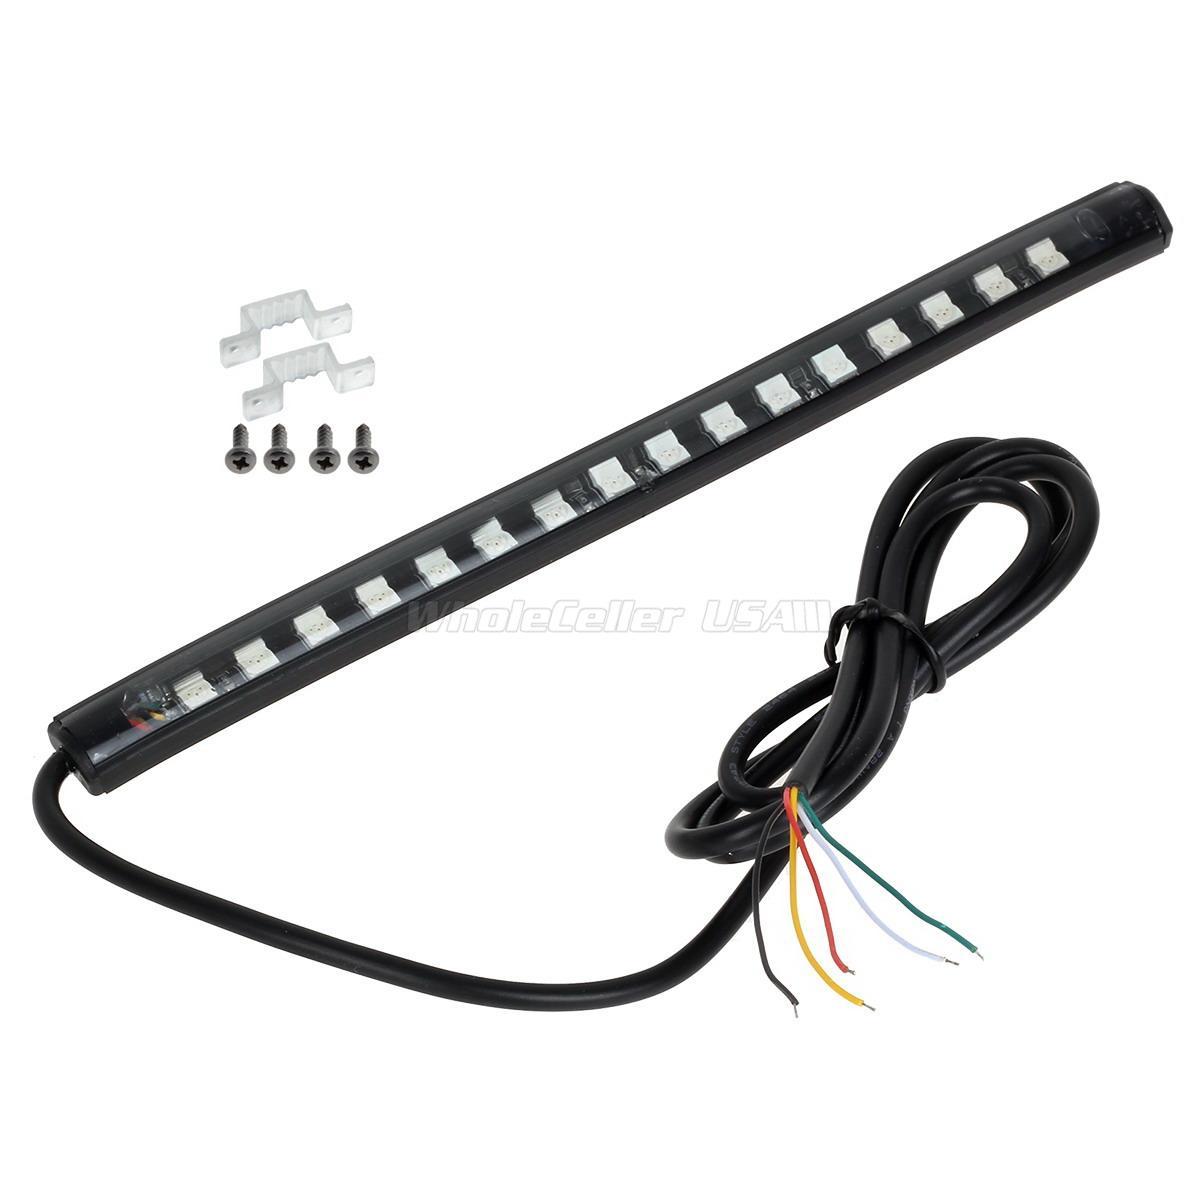 20cm Integrated Tail Brake Amp Turn Signal Led Light Strip